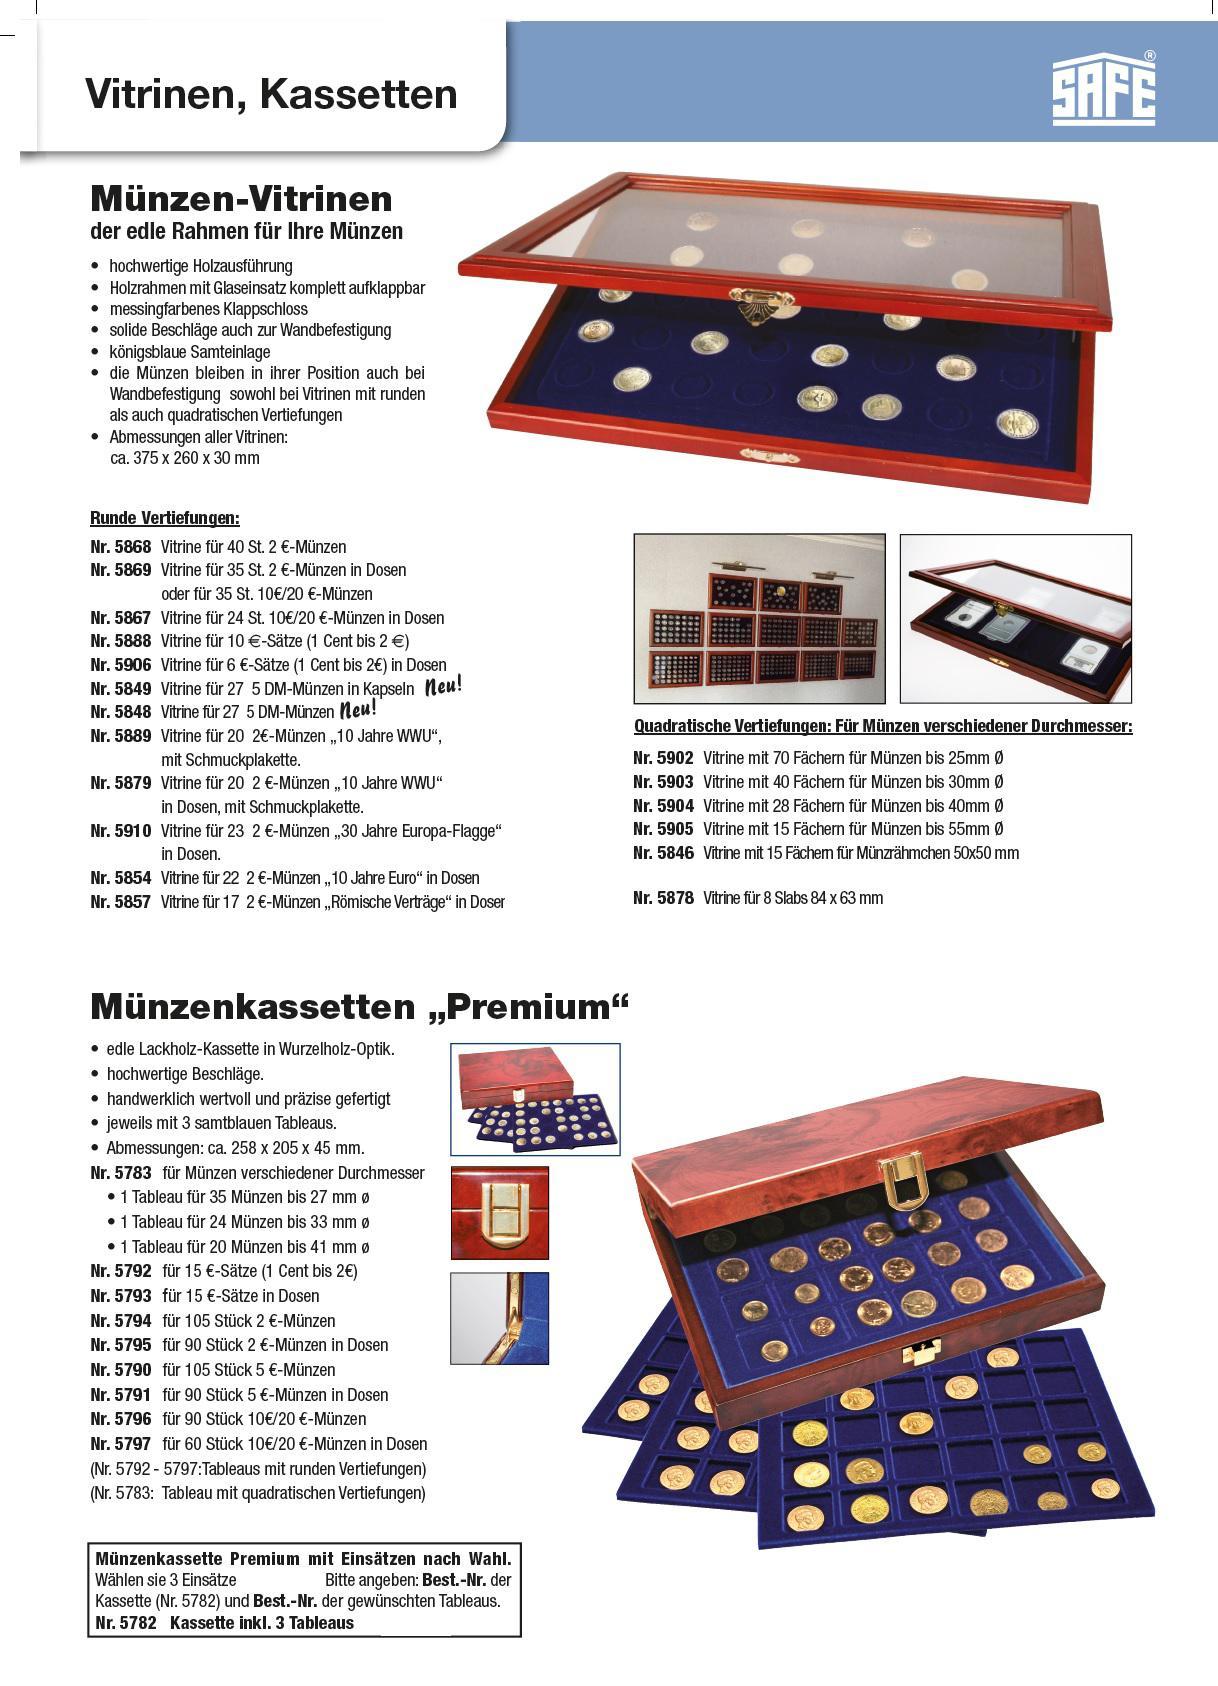 SAFE 5910 Echt Holz Münzvitrinen Vitrinen 23 x 2 Euromünzen \